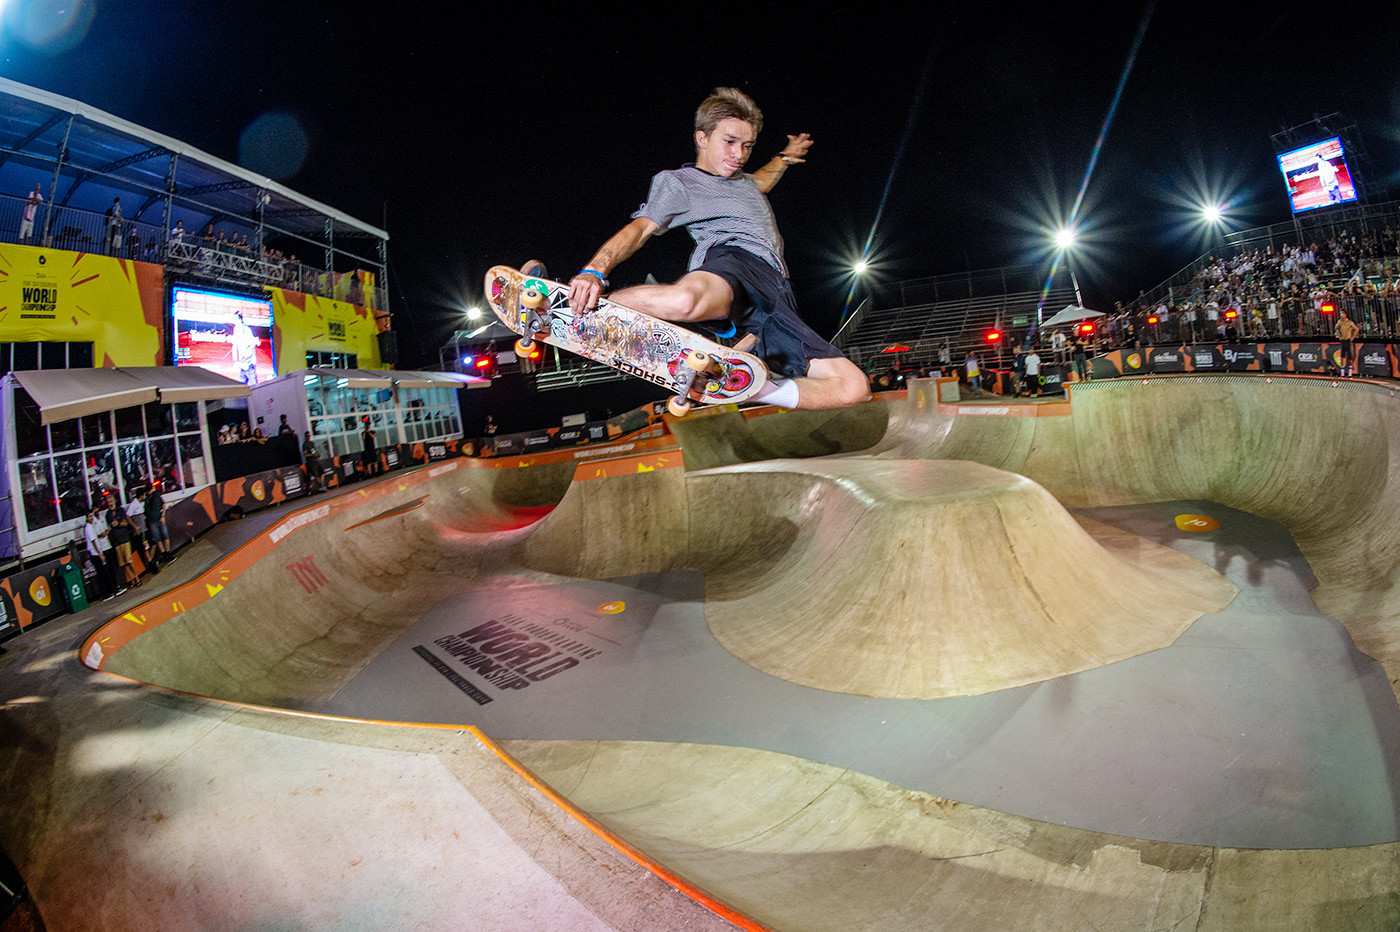 Open qualifying has  taken place at the World Skate Park World Championships in Brazil ©World Skate